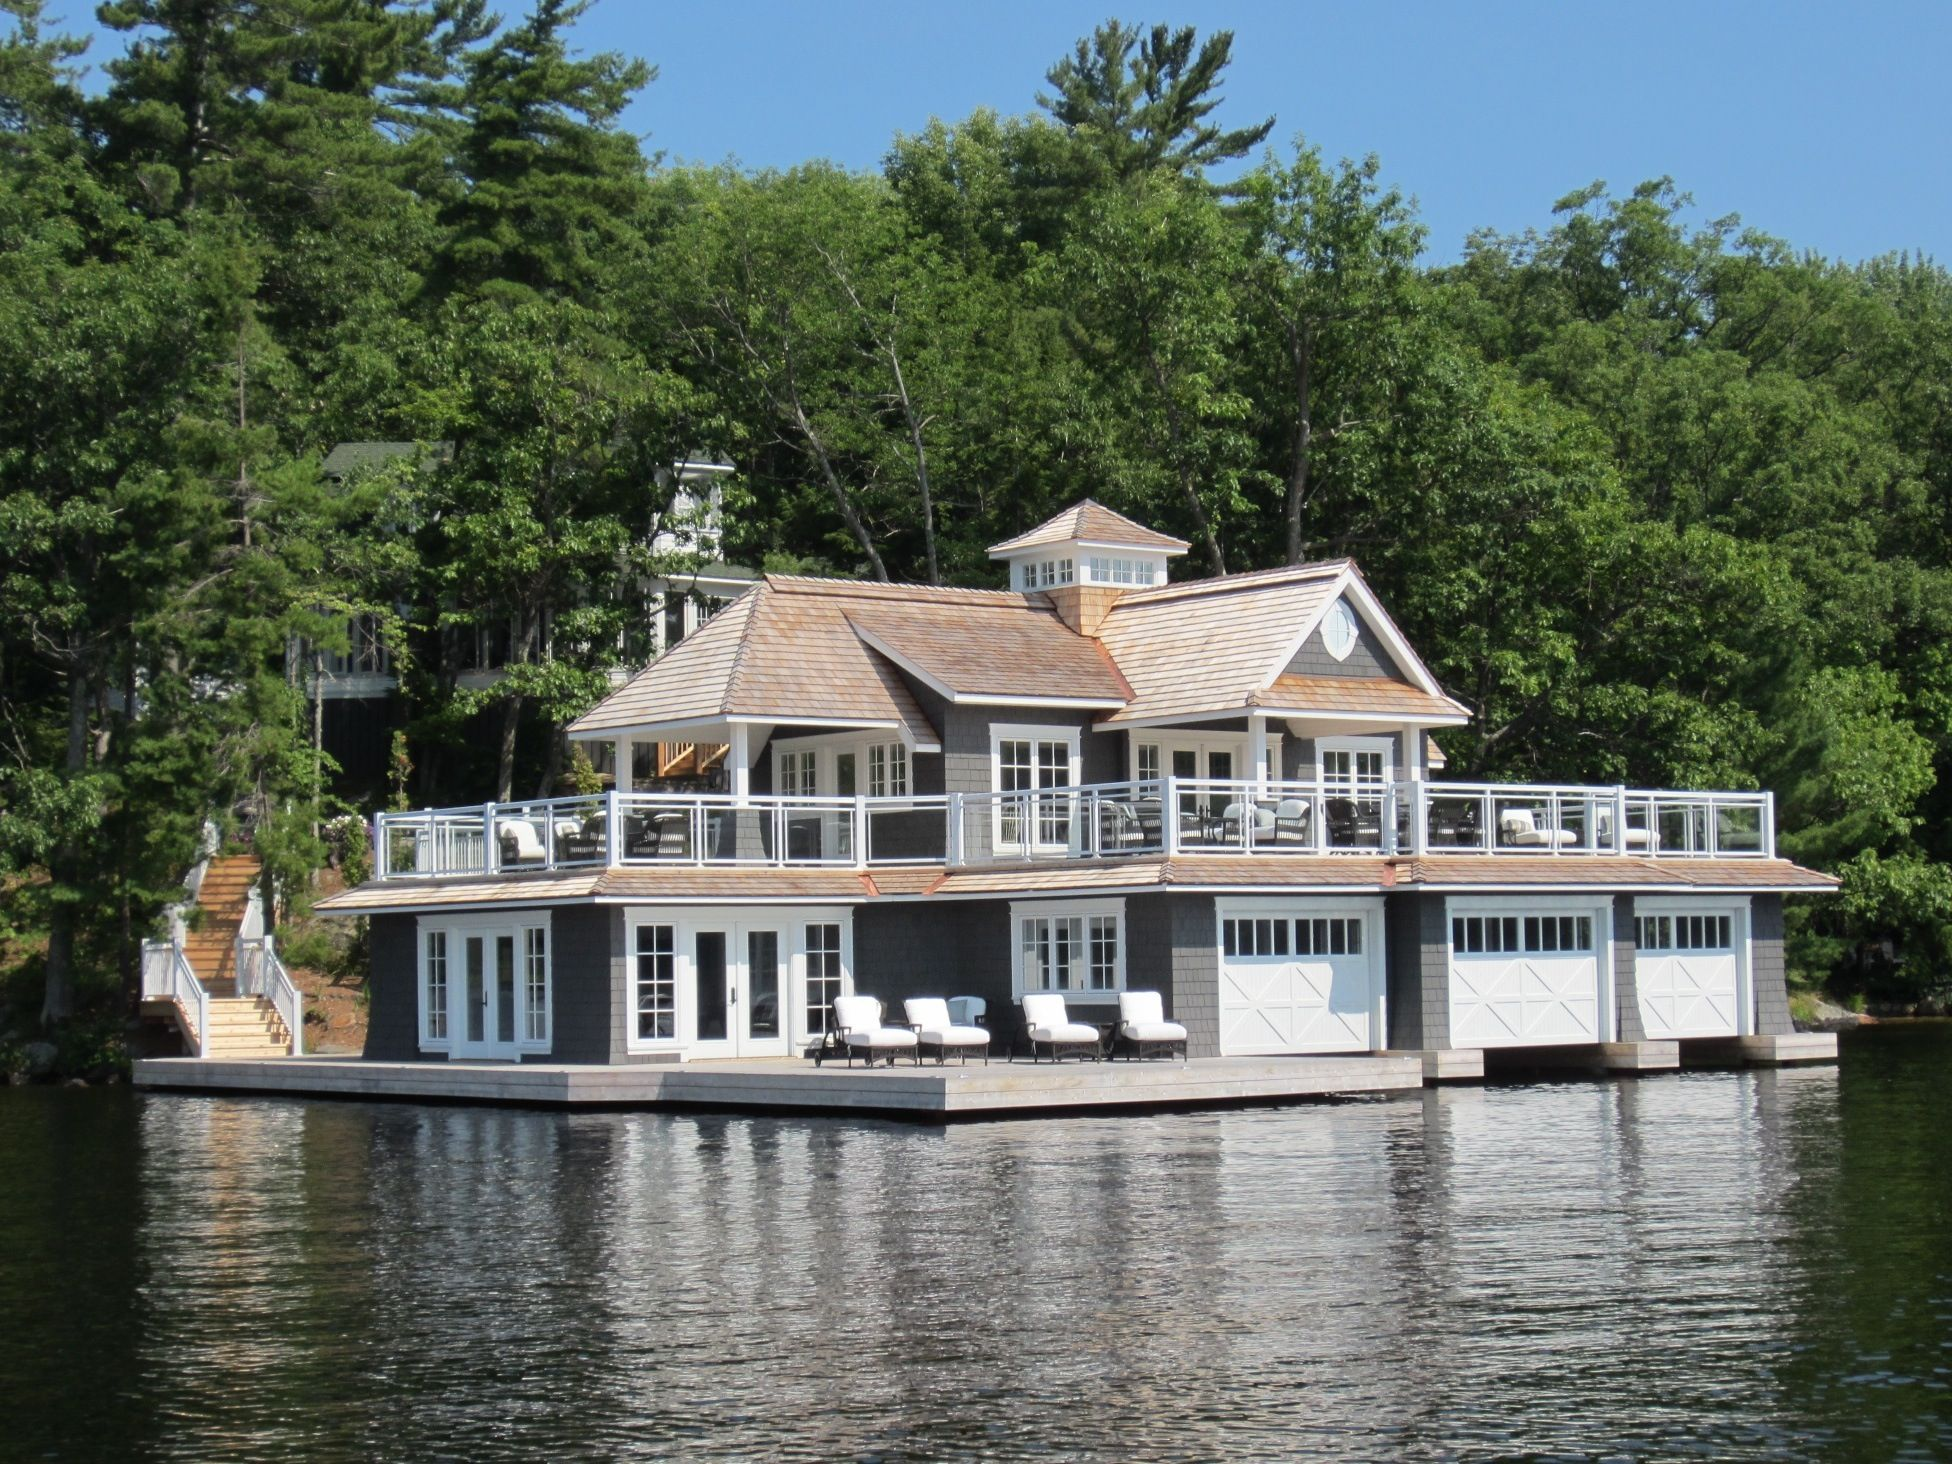 This Is A Beautiful Boathouse On Muskoka Lakes Ontario